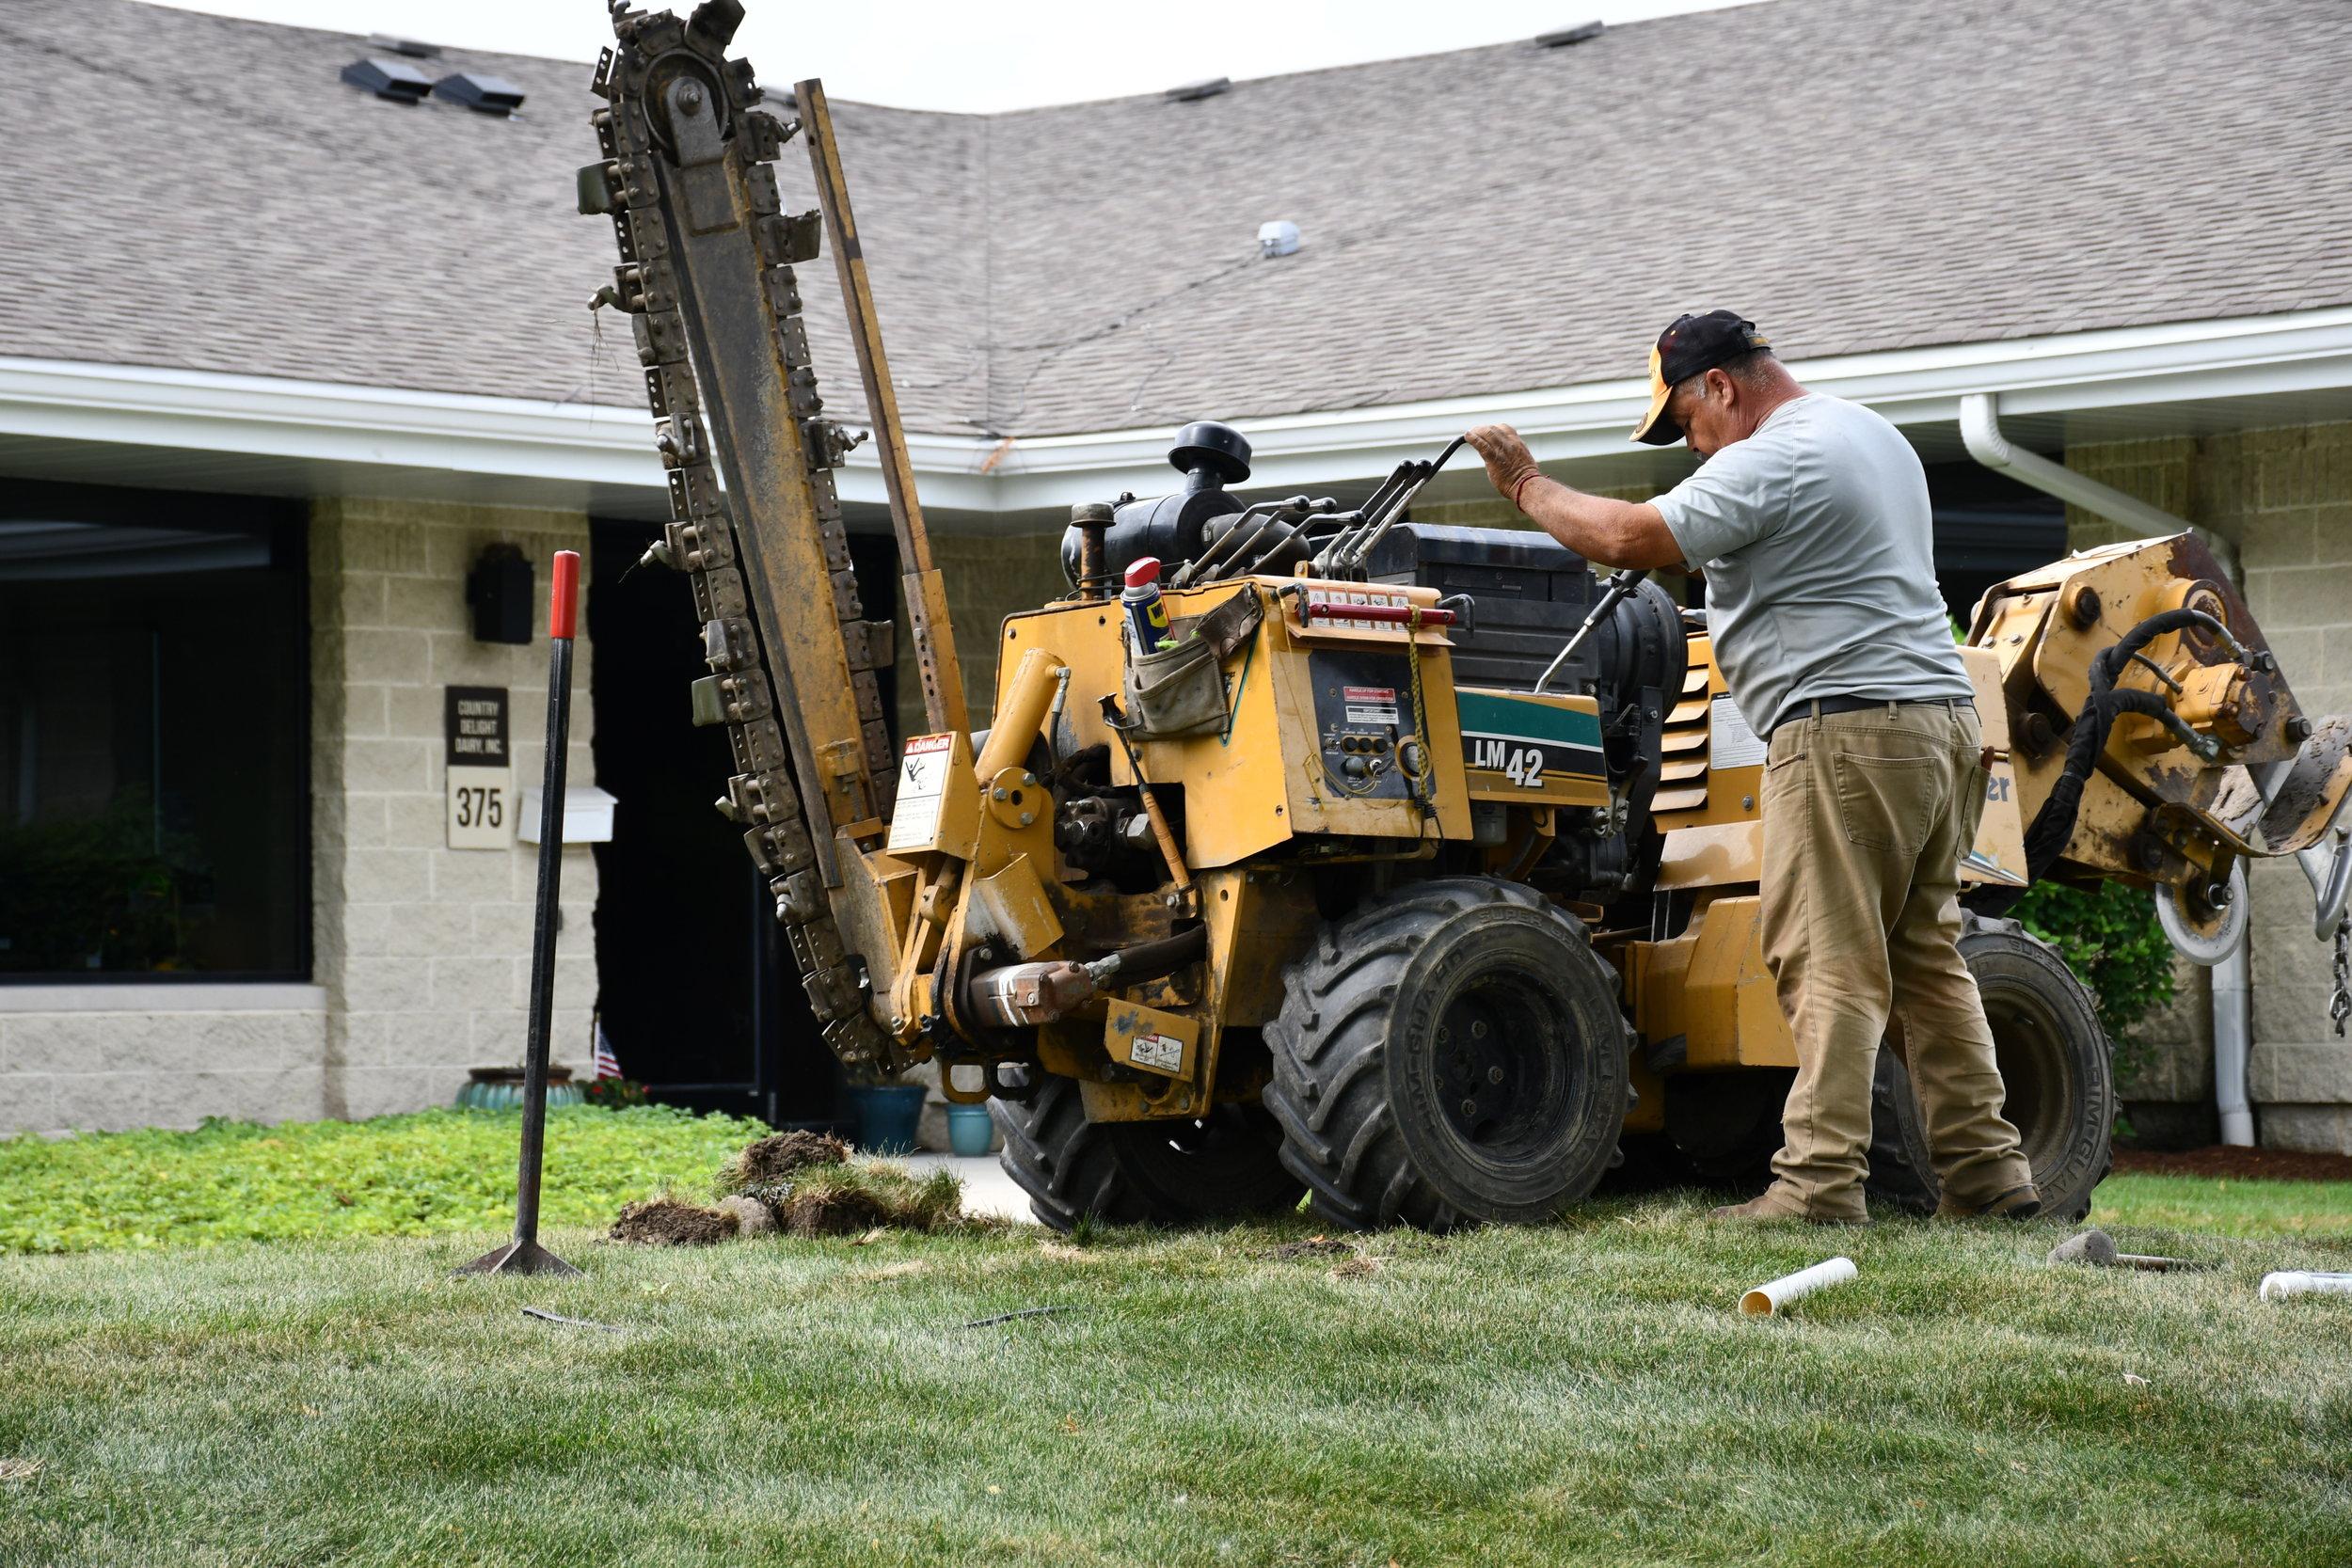 Westmont Sprinkler Project - July 2018, Carefree Lawn Sprinkler Inc., helped install a commercial sprinkler systems in Westmont, IL